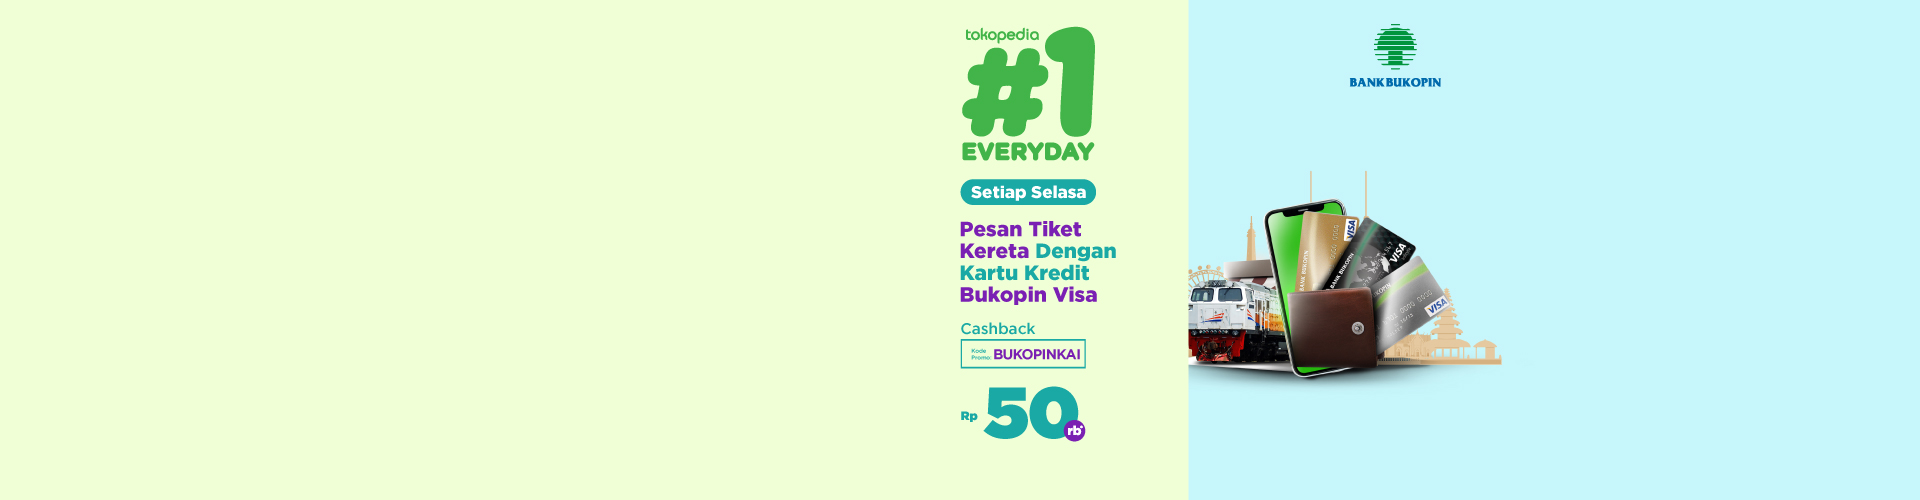 Setiap Selasa Pesan Tiket Kereta Pakai Kartu Kredit Bukopin Cashback hingga 50 rb!